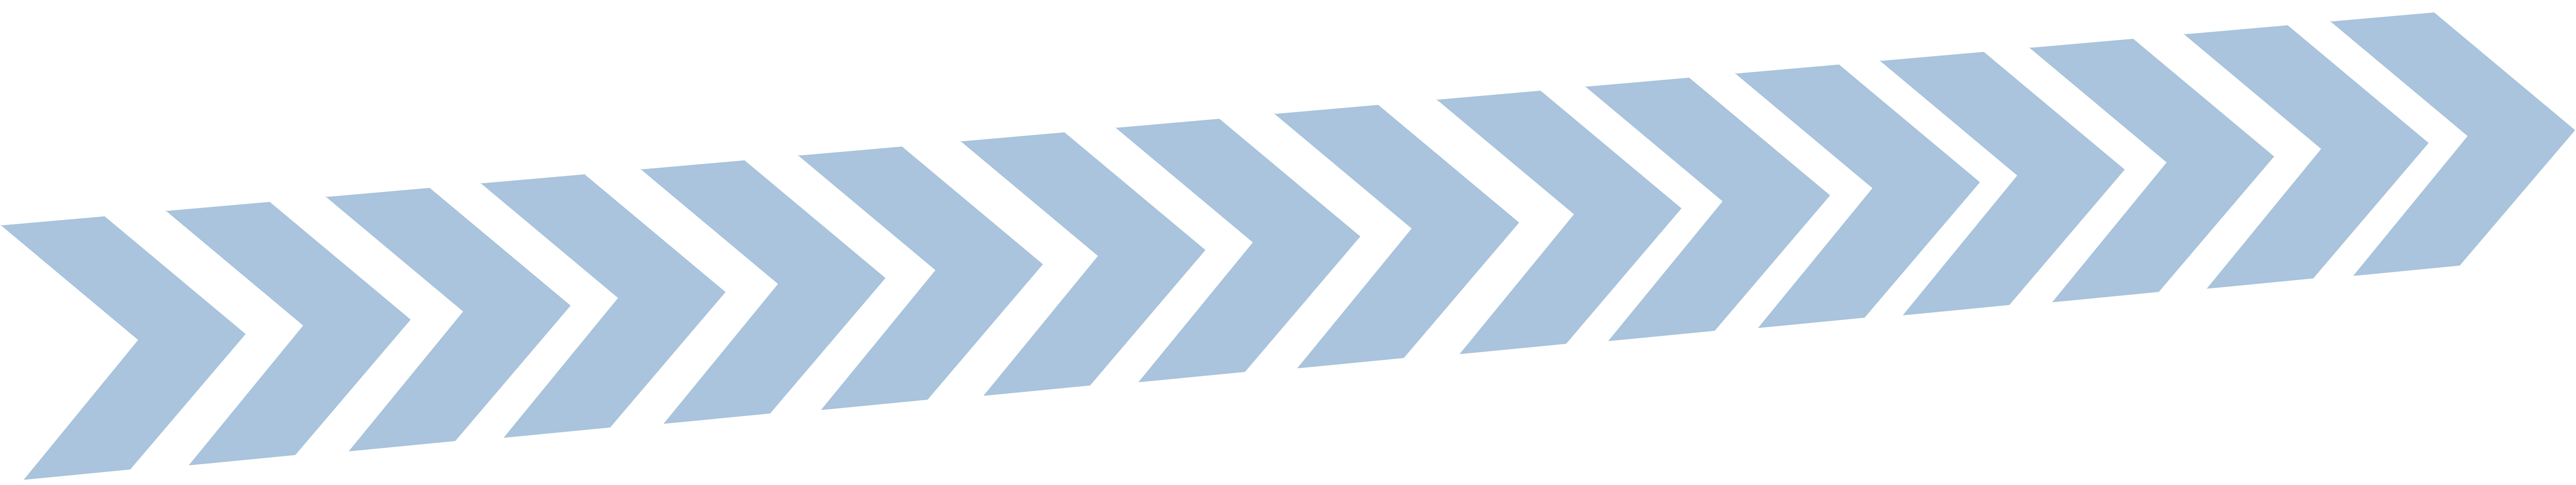 Flow Stripe image